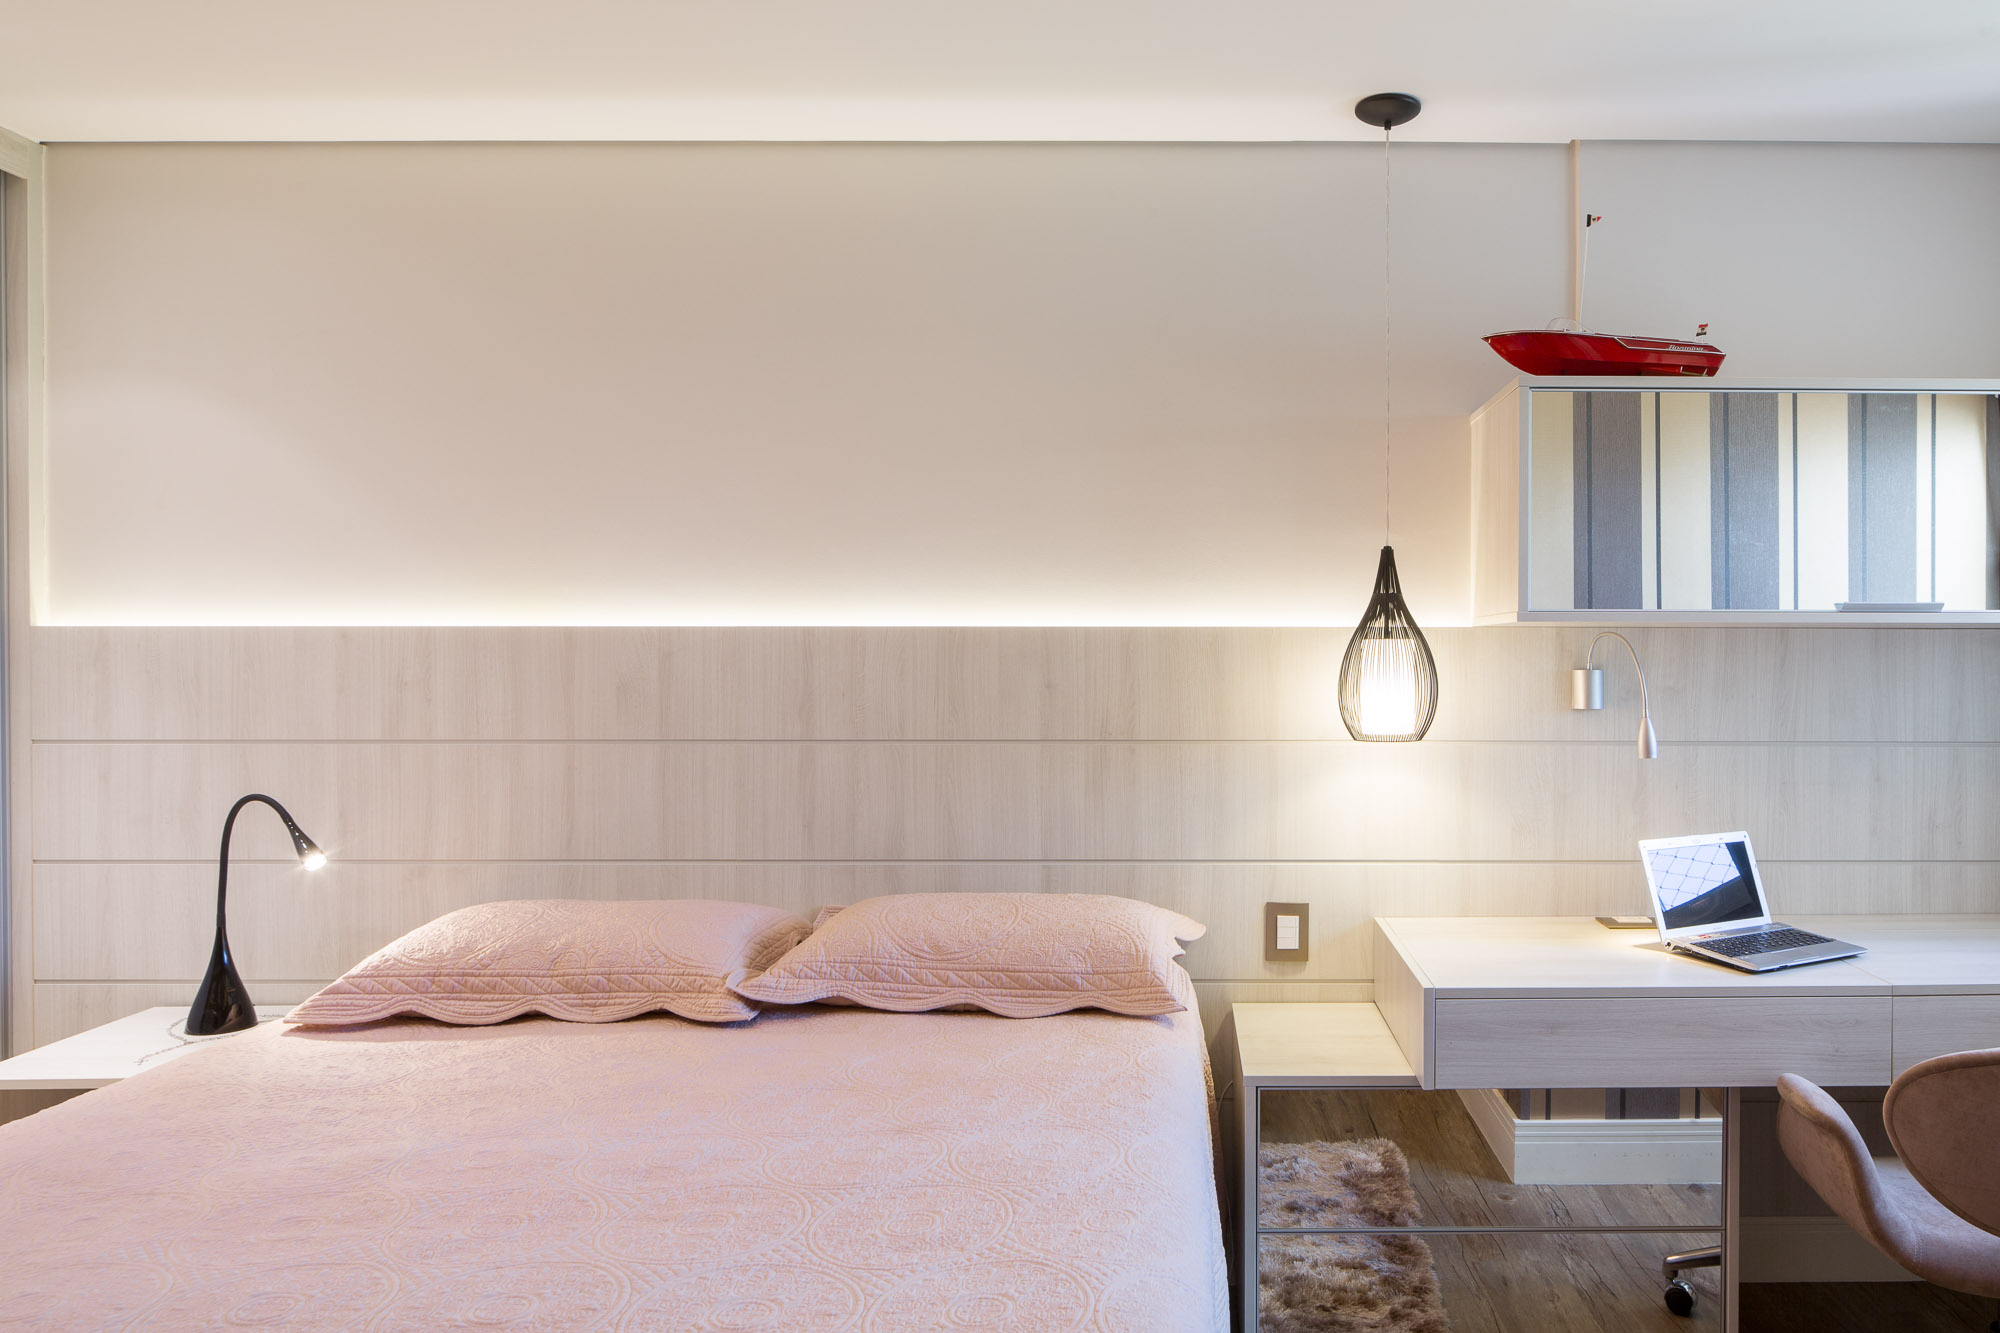 Borém & Borém design e interiores, 2014